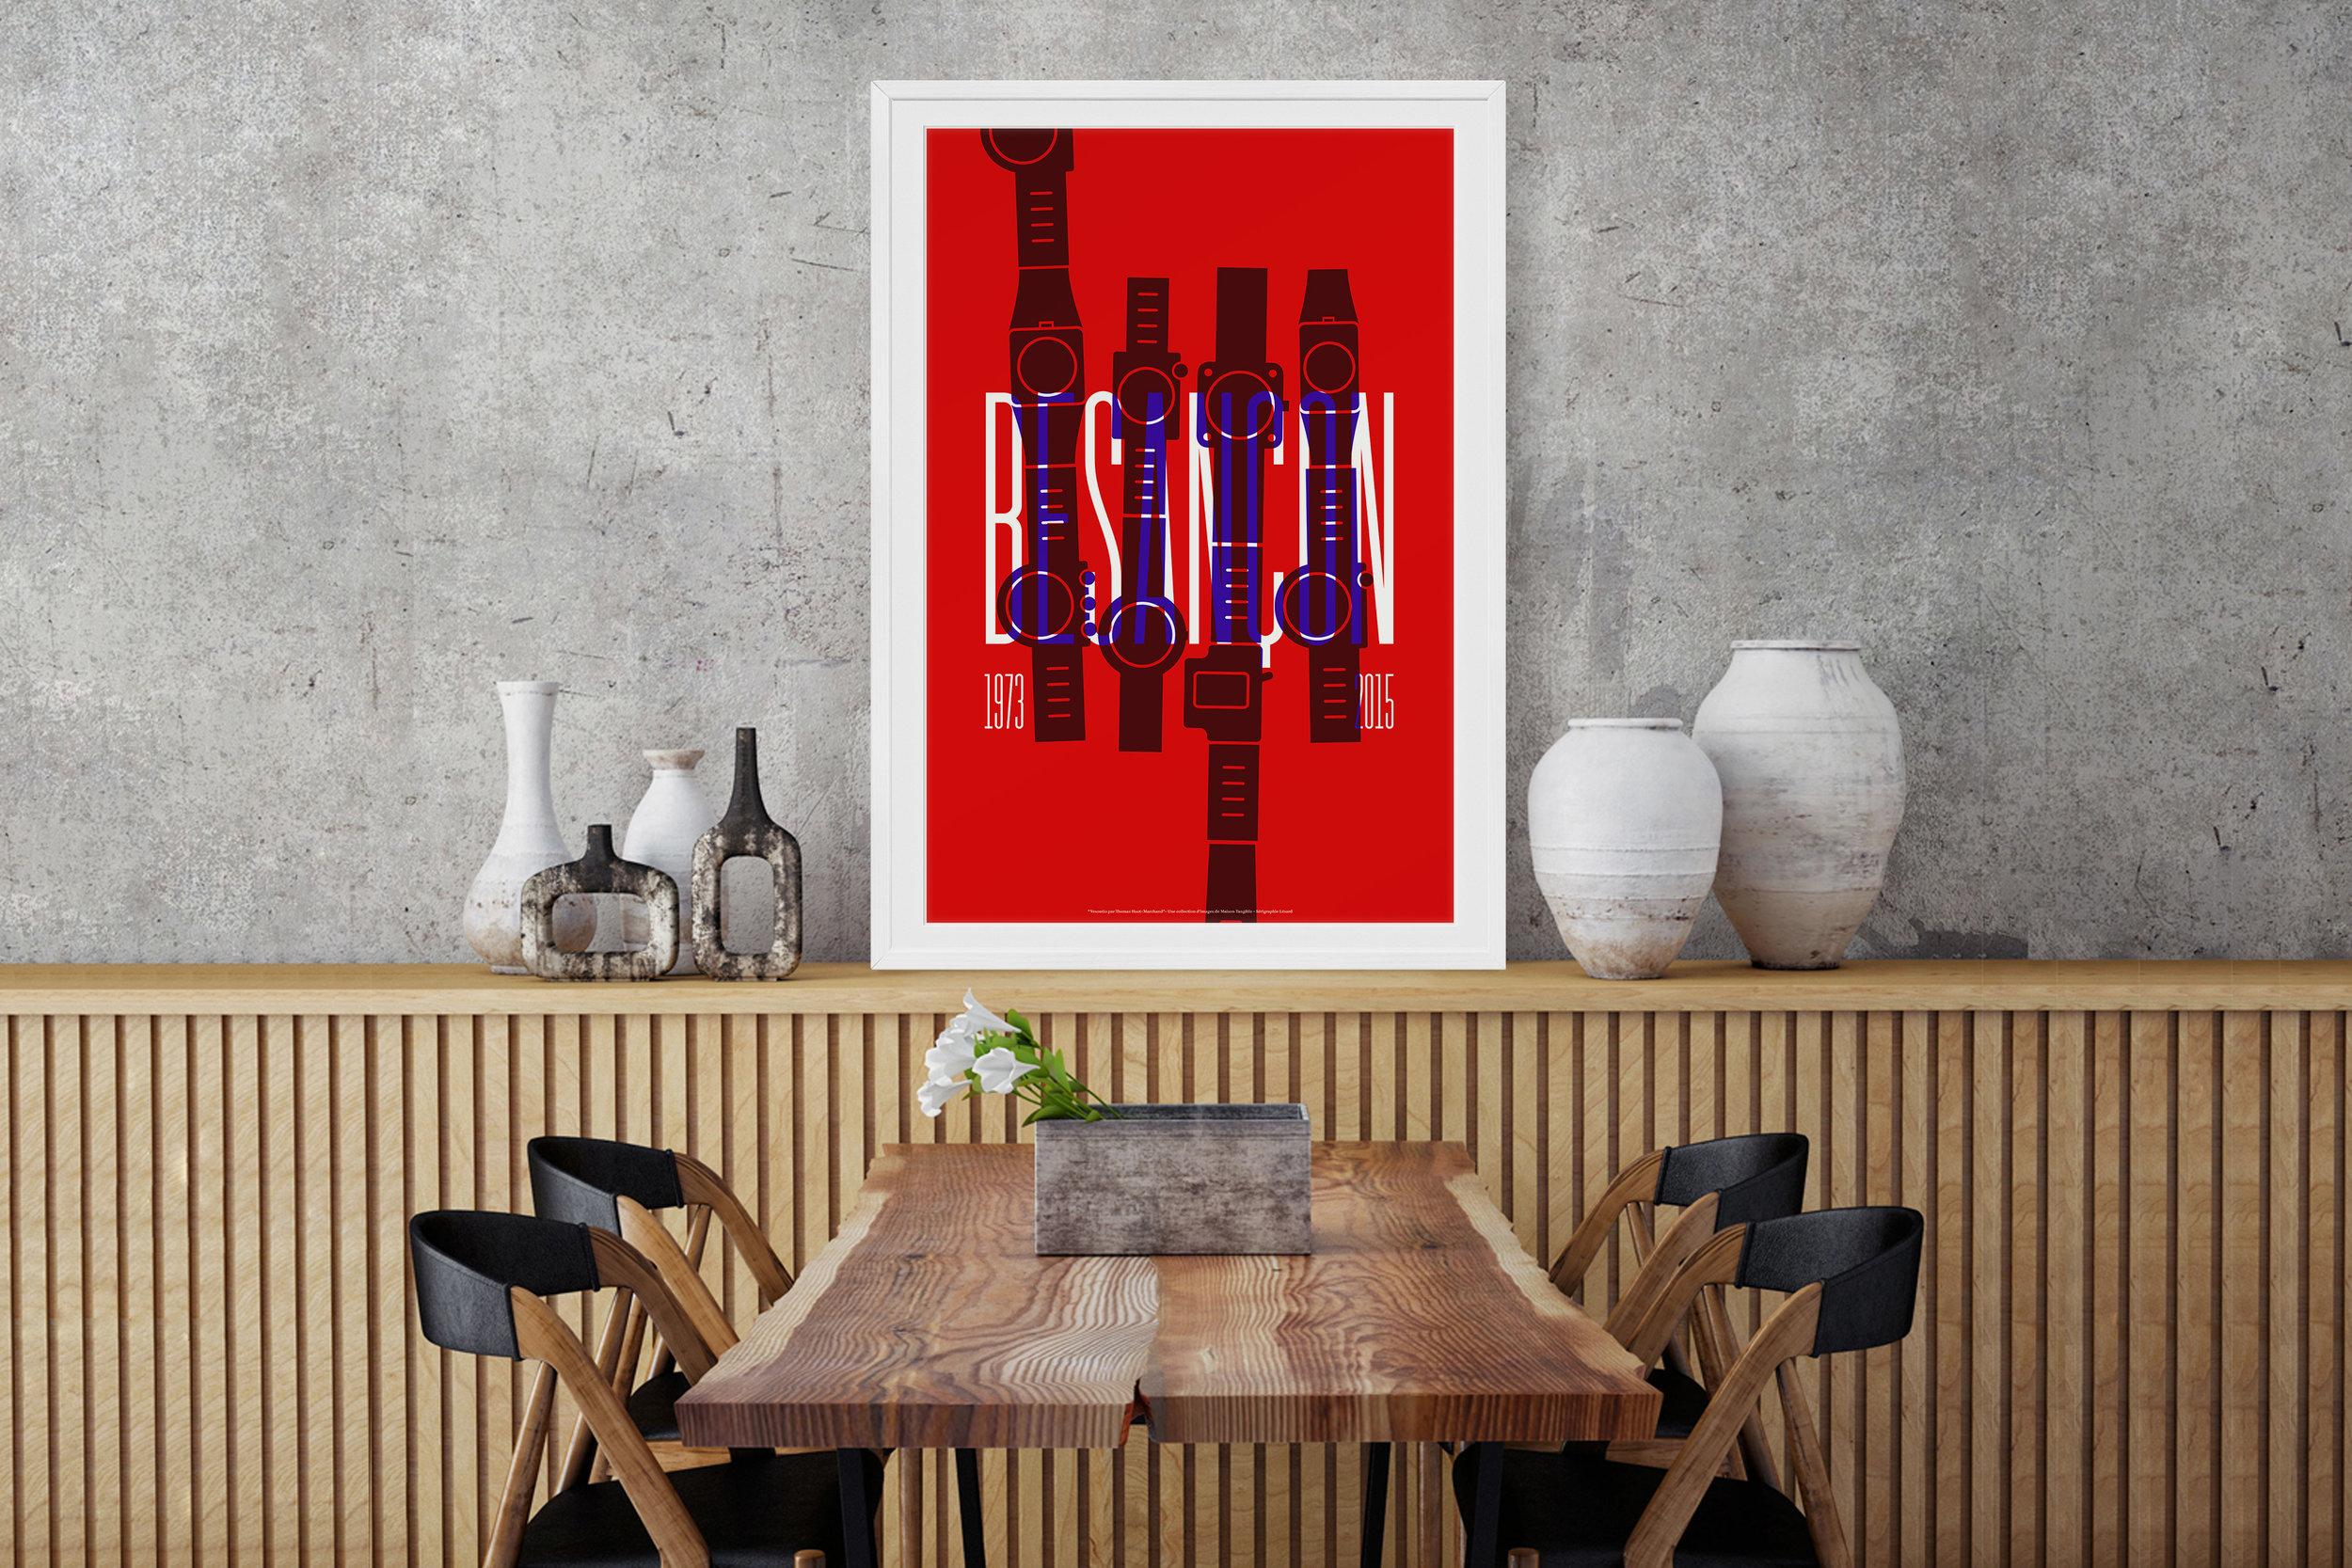 Maison-Tangible-Manufacture-images-objets-Besancon-Produits_Vesontio_Affiche_ThomasHuotMarchand_02.jpg